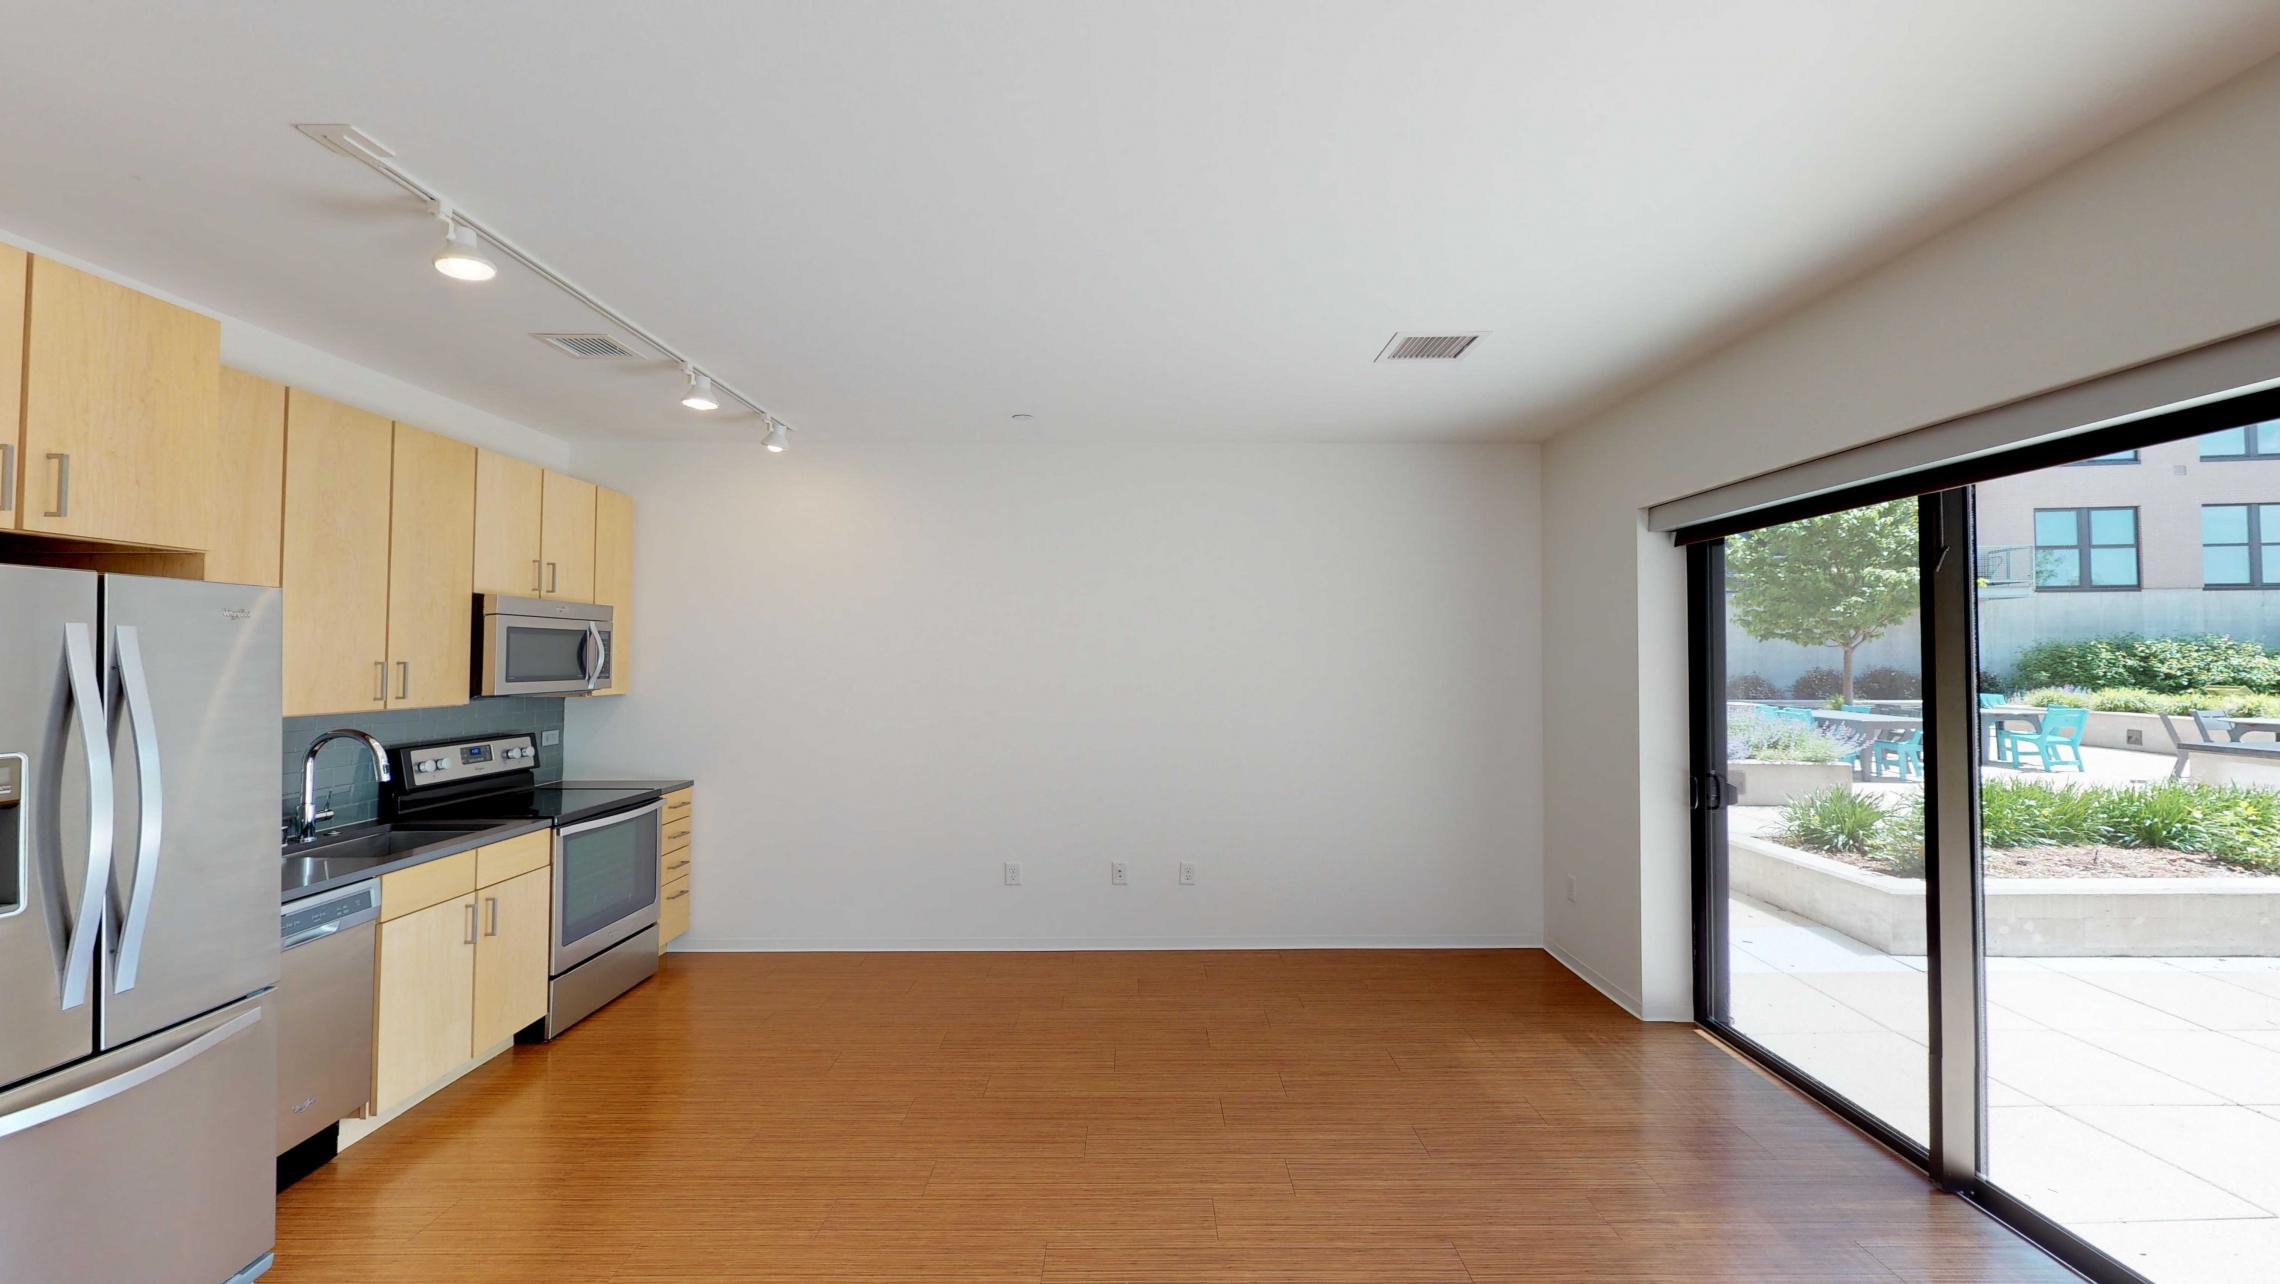 SEVEN27-Apartment-115-studio-lake view-modern-upscale-downtown-madison-patio-courtyard-living room-kitchen.-lifestyle.jpg